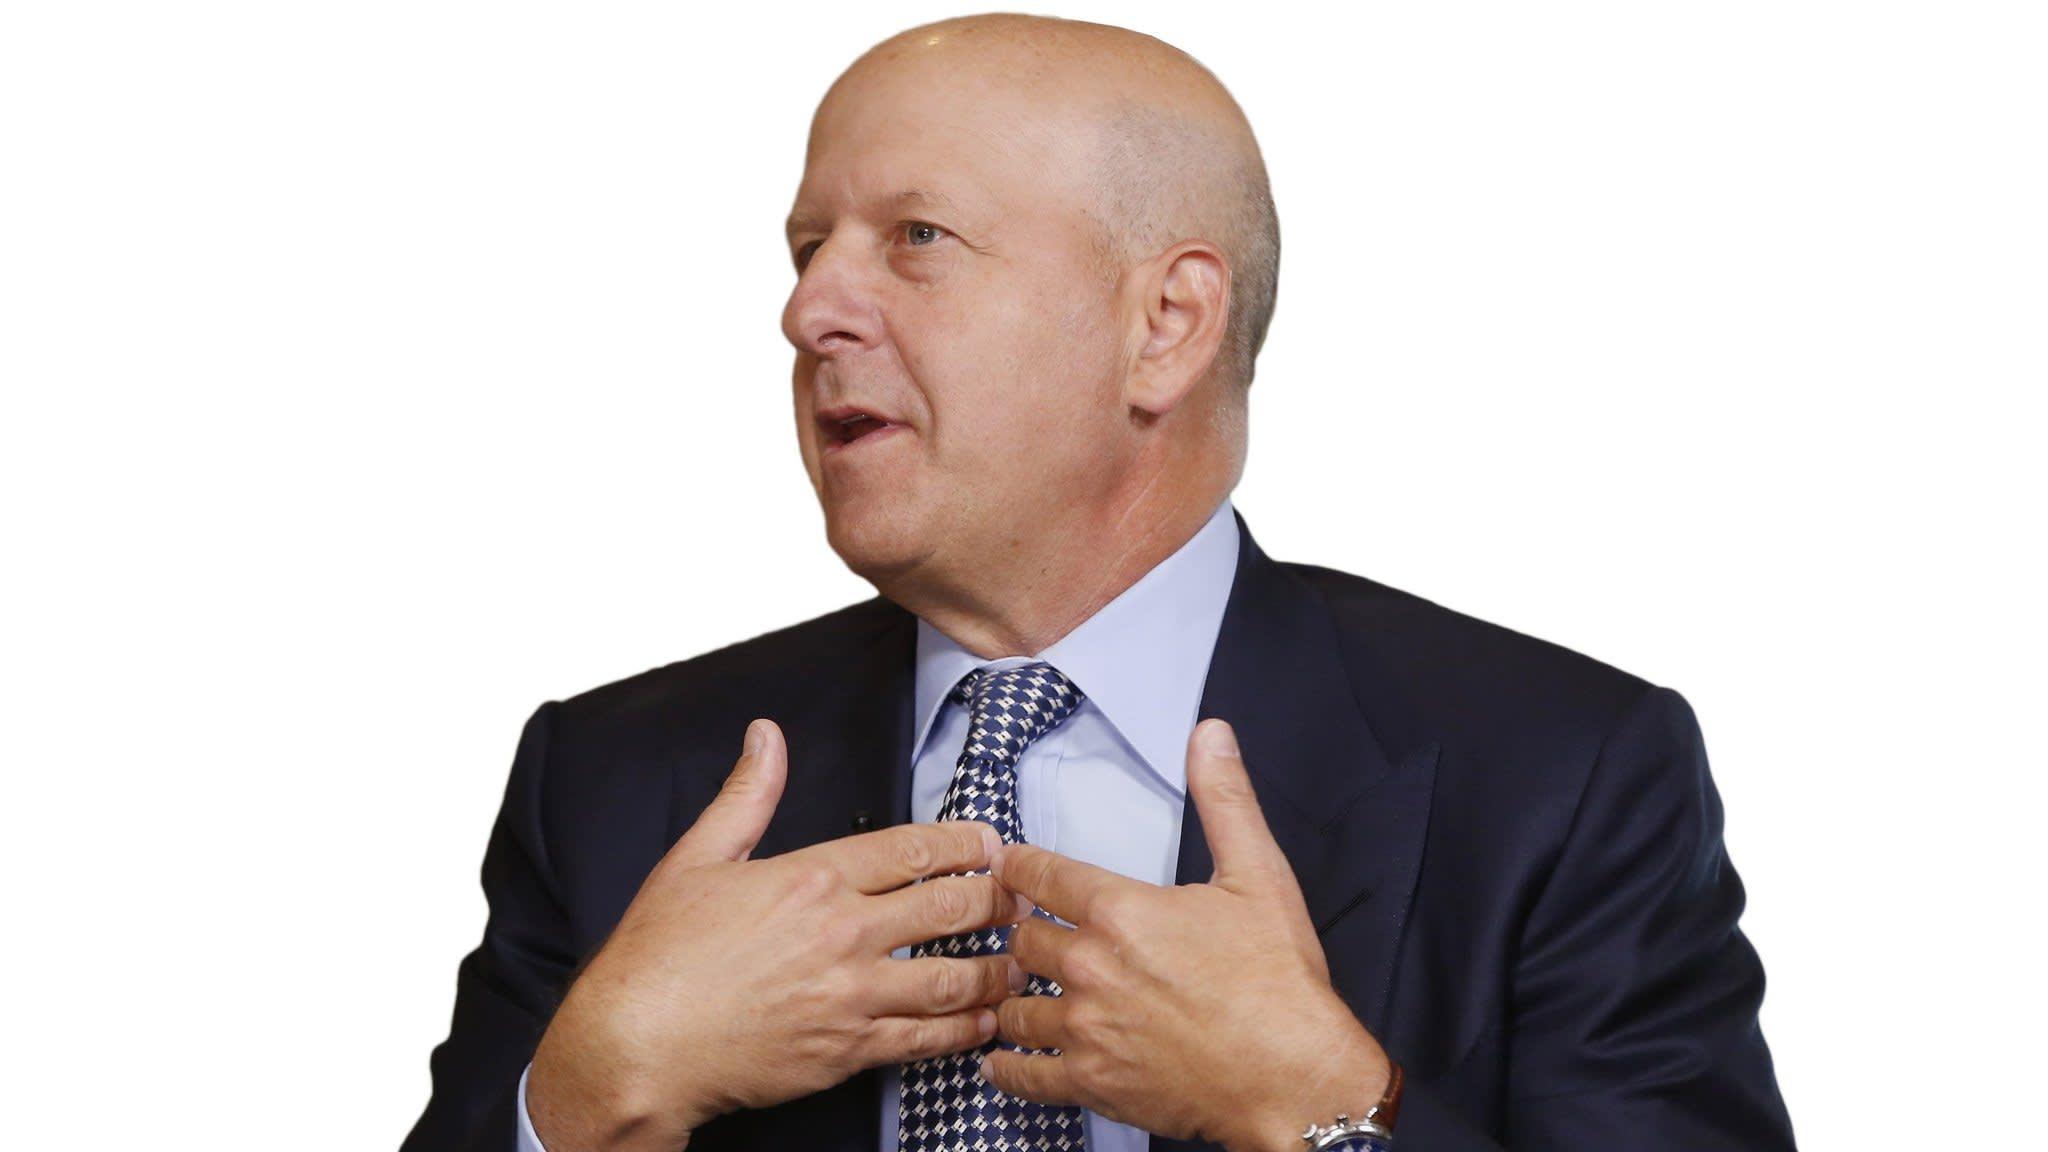 Goldman Sachs names new finance chief, president